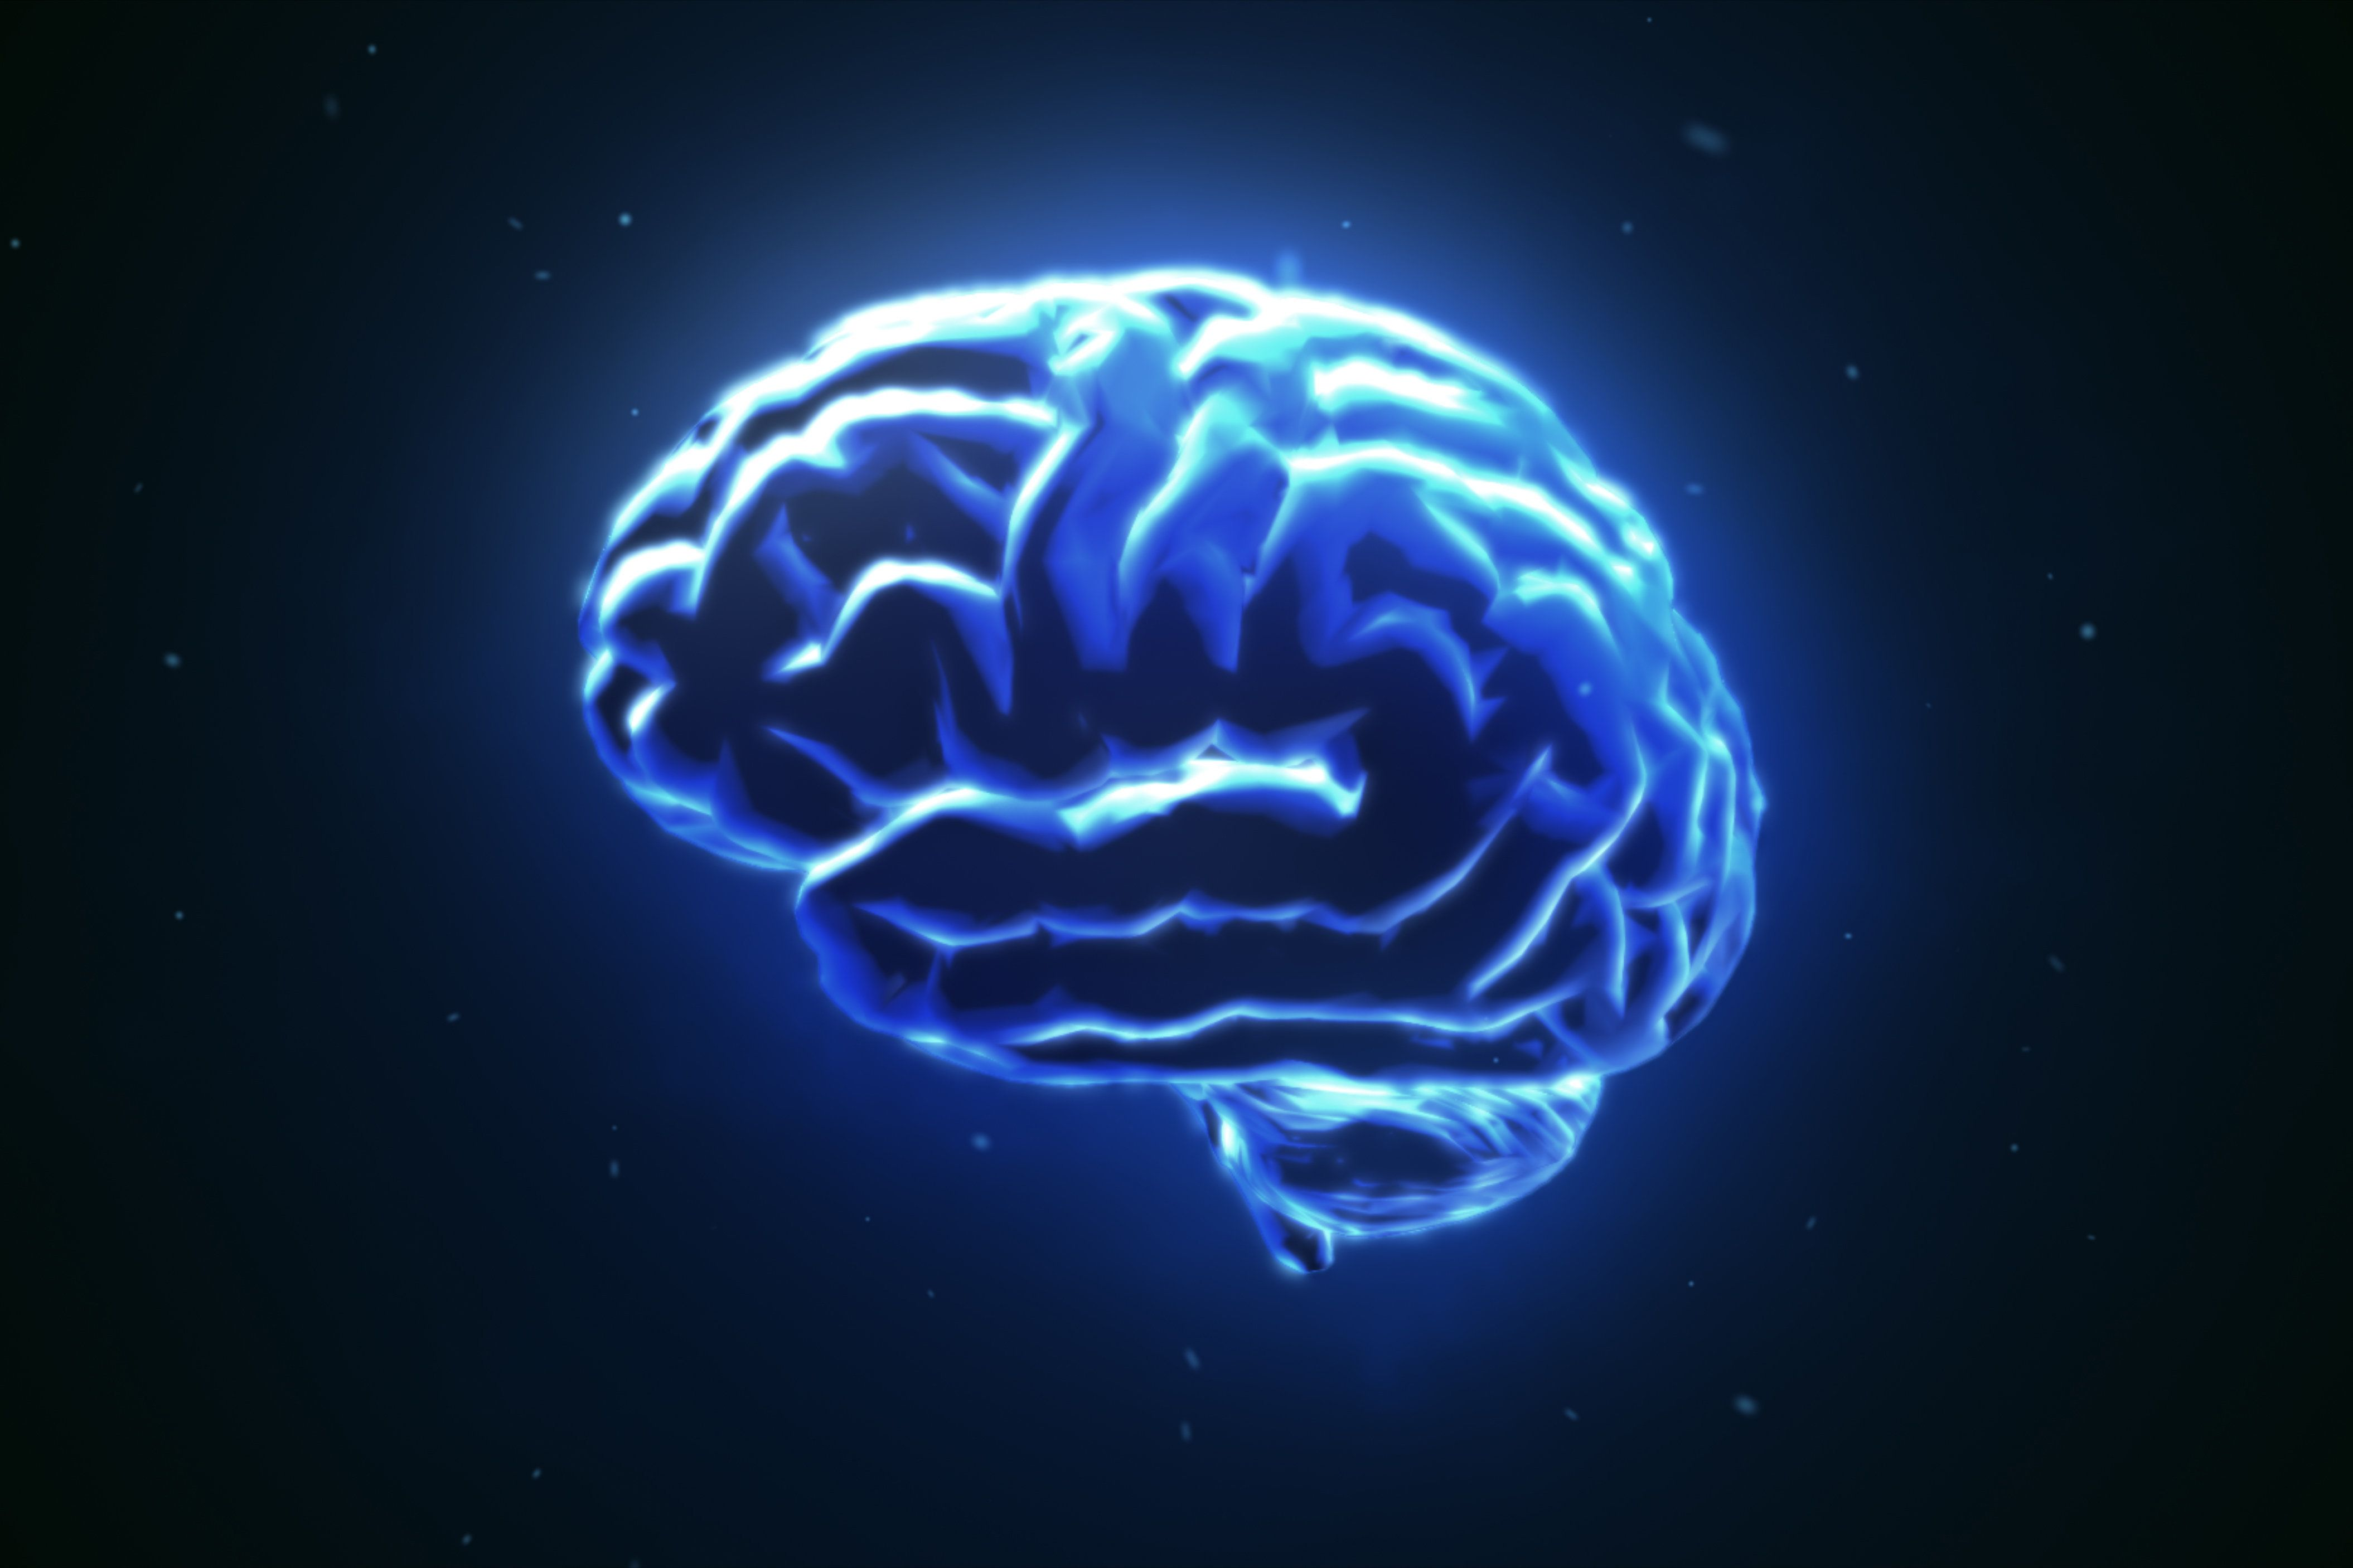 Epilepsy Symptoms, Diagnosis And Treatment